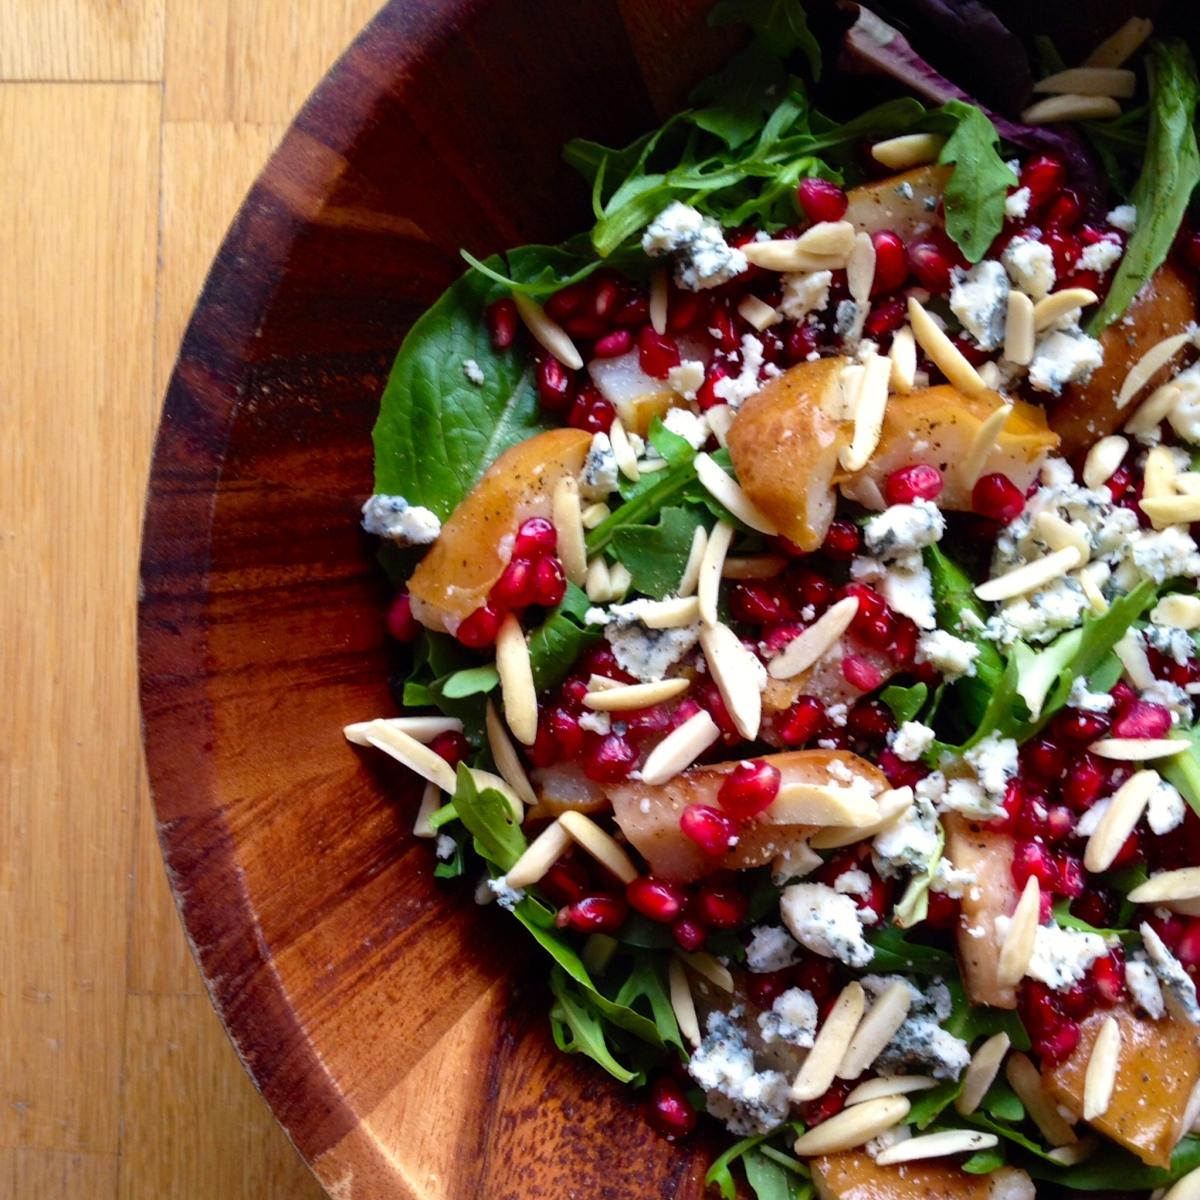 Fall Salad: Roasted Pear, Pomegranate, And Gorgonzola With